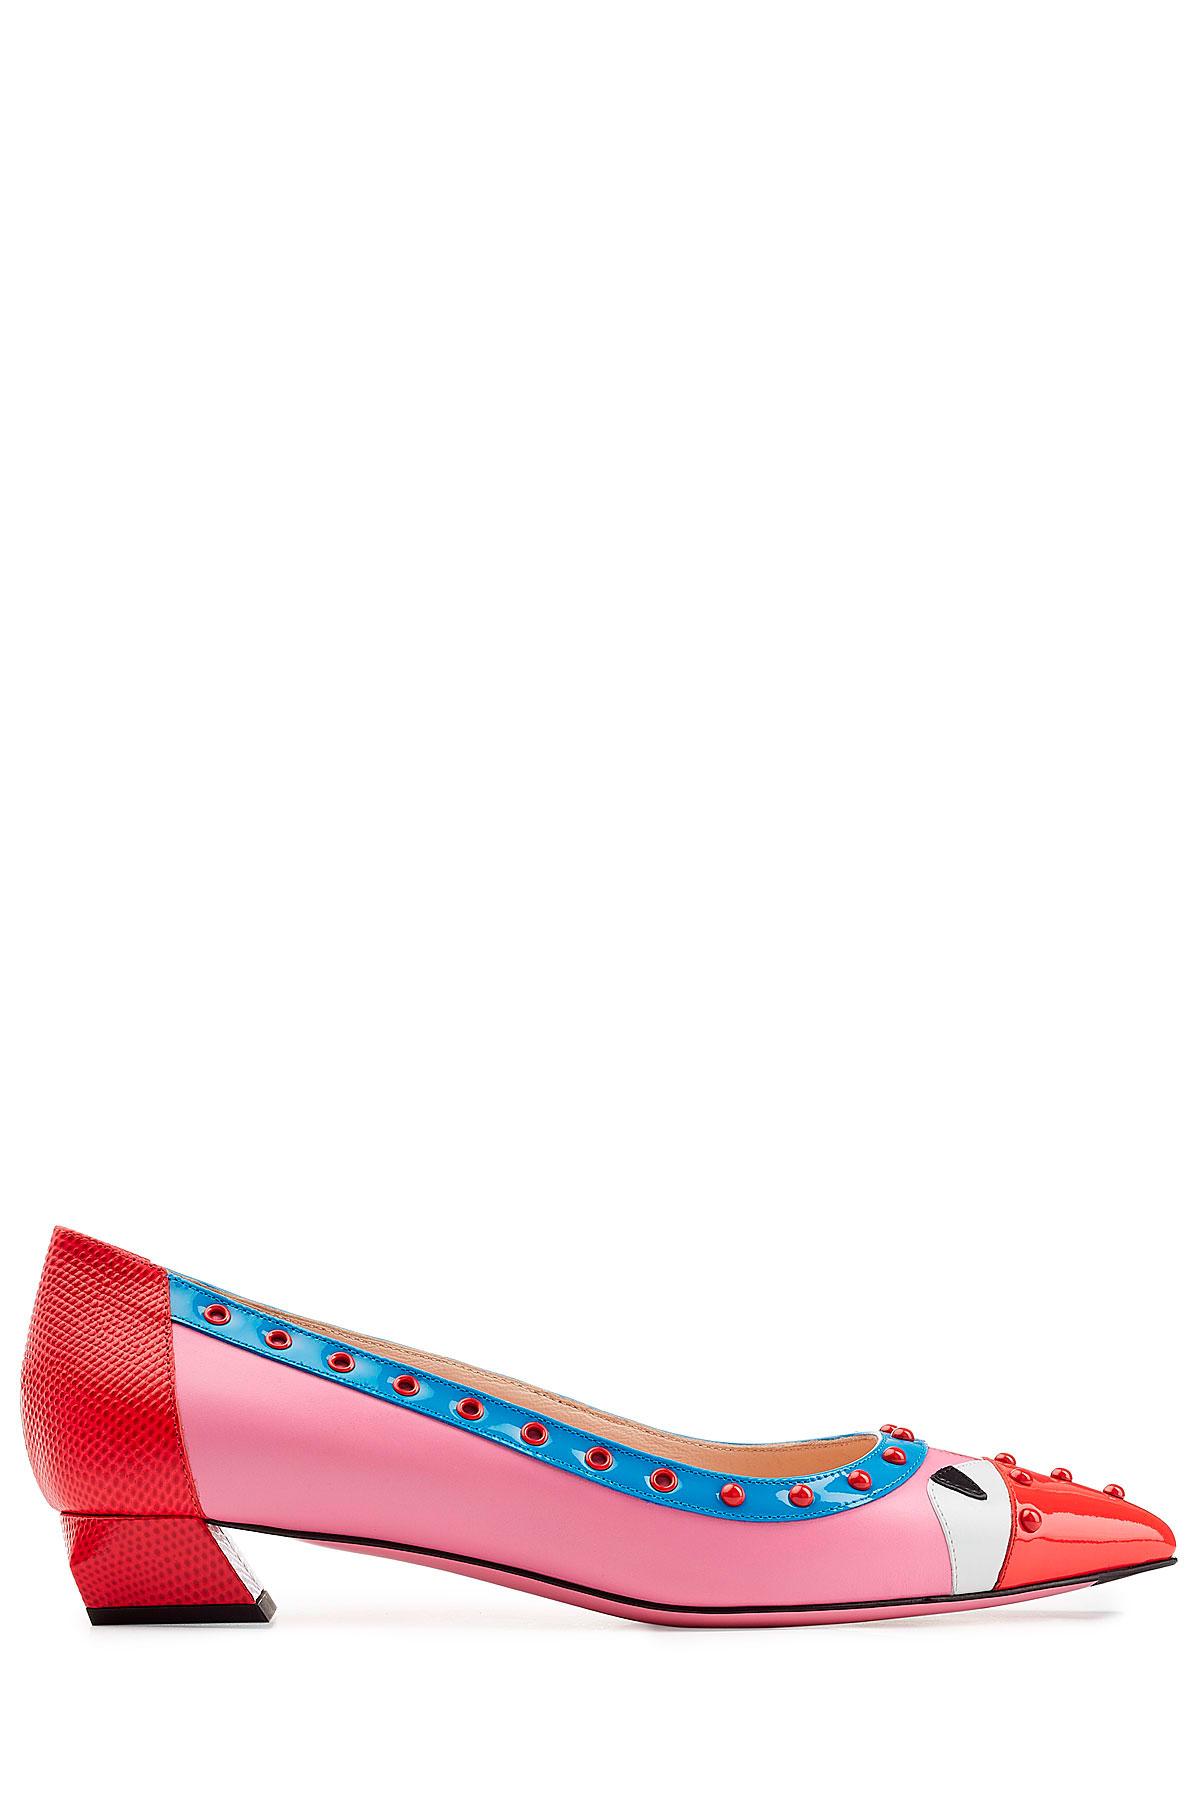 20703e65a2 Fendi Embellished Leather Color Block Kitten Heel Pumps - Multicolor ...